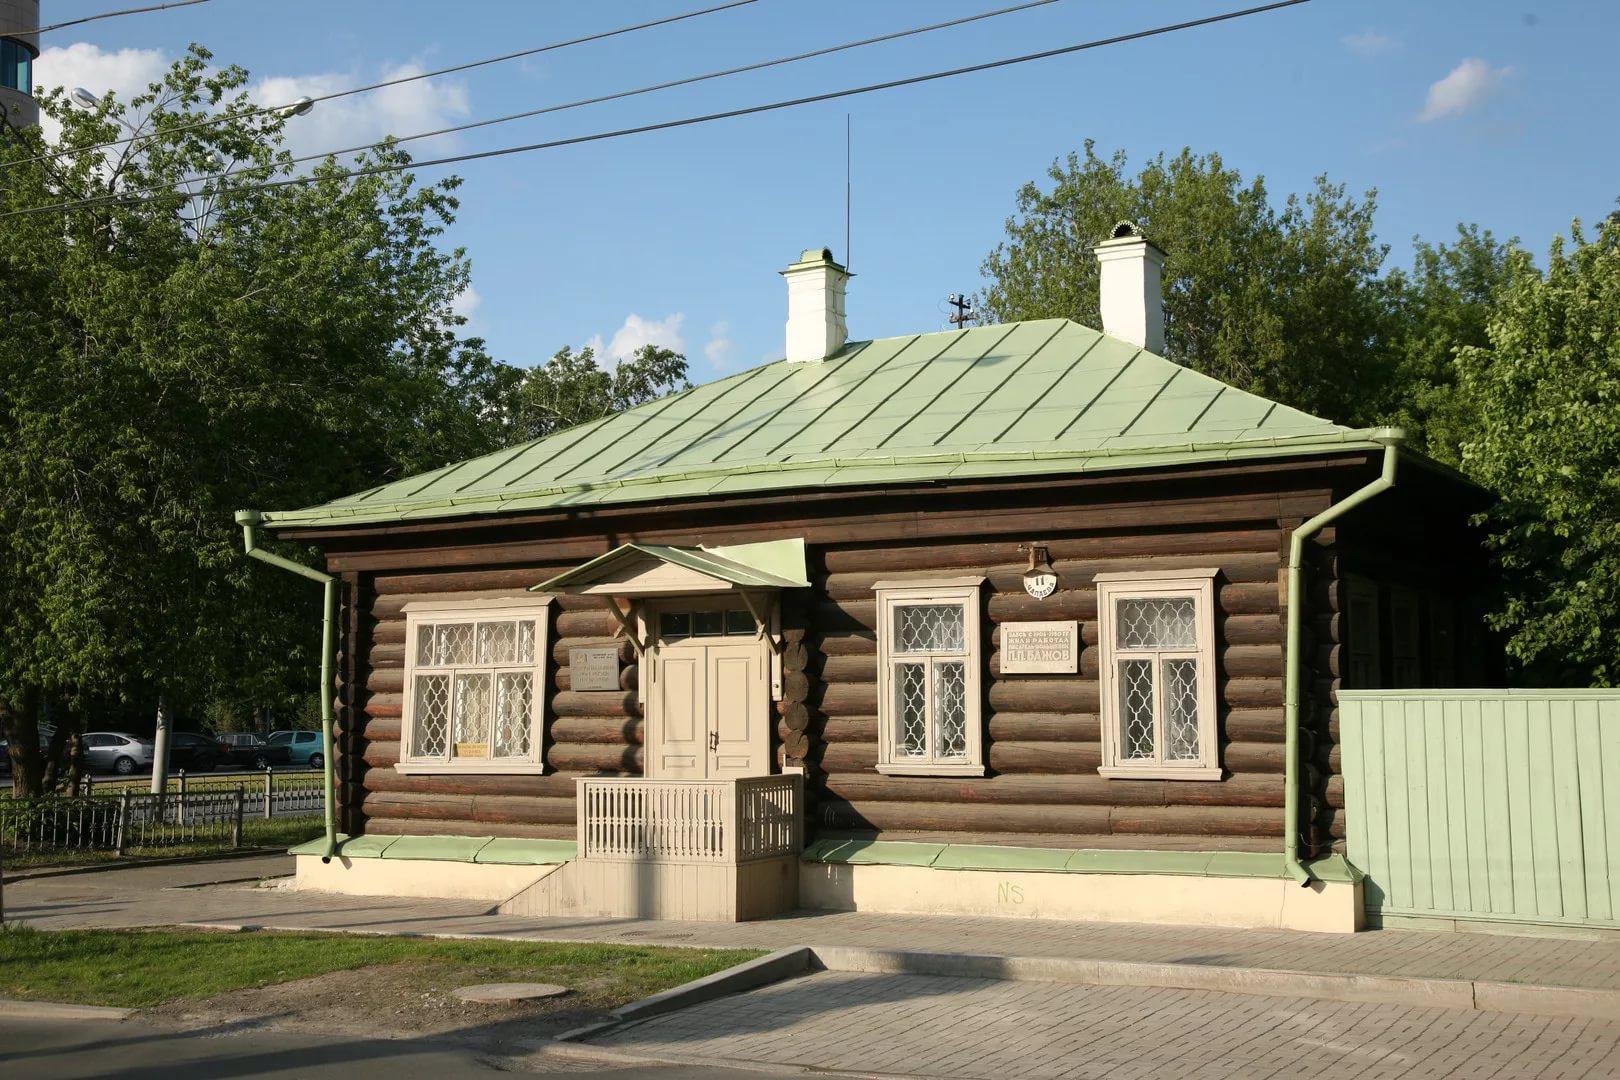 Дом-музей П.П. Бажова, Верхняя Сысерть